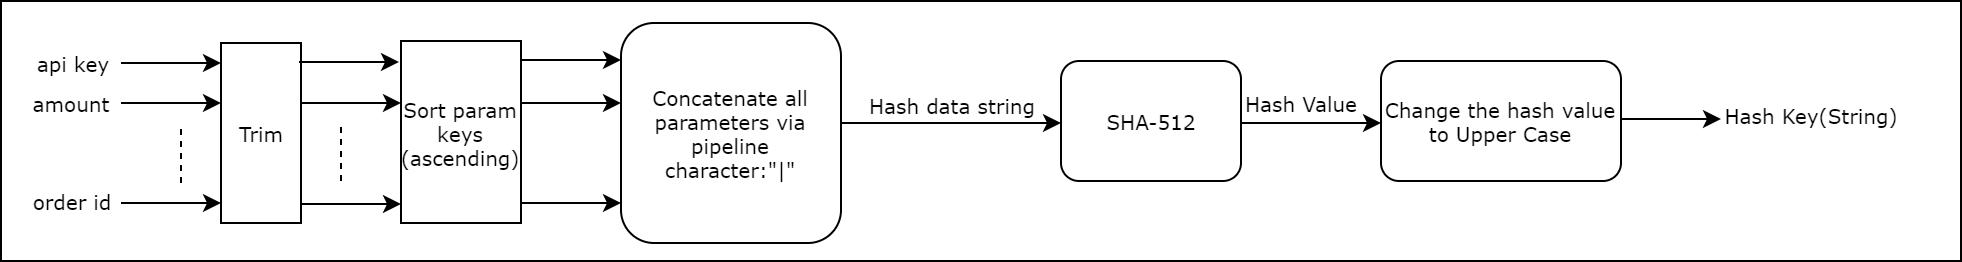 Hash Calculation